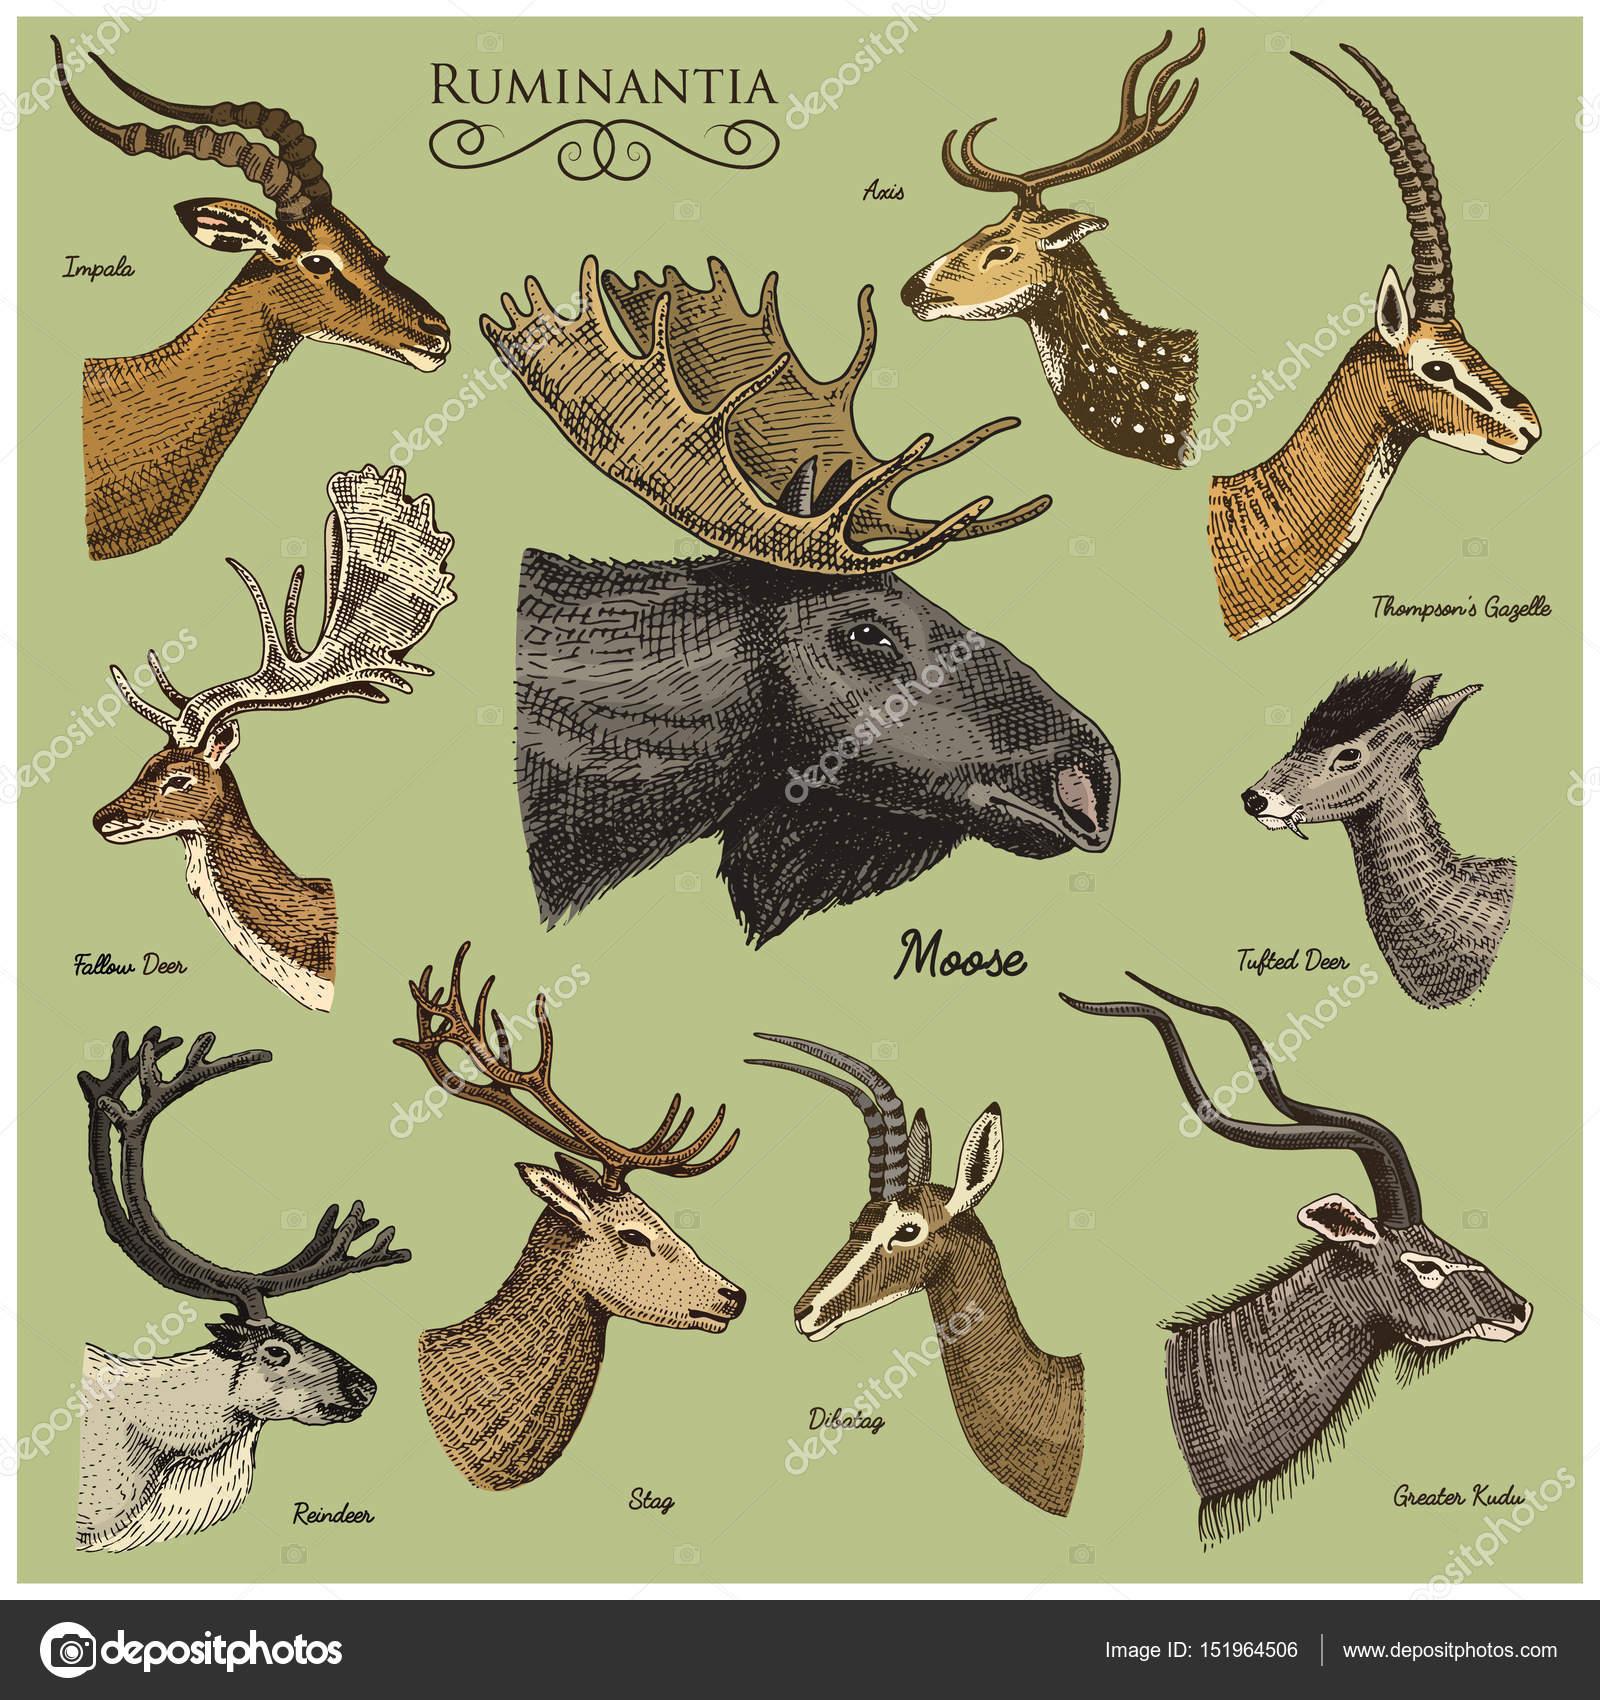 1600x1700 Big set of Horn, antlers Animals moose or elk with impala, gazelle